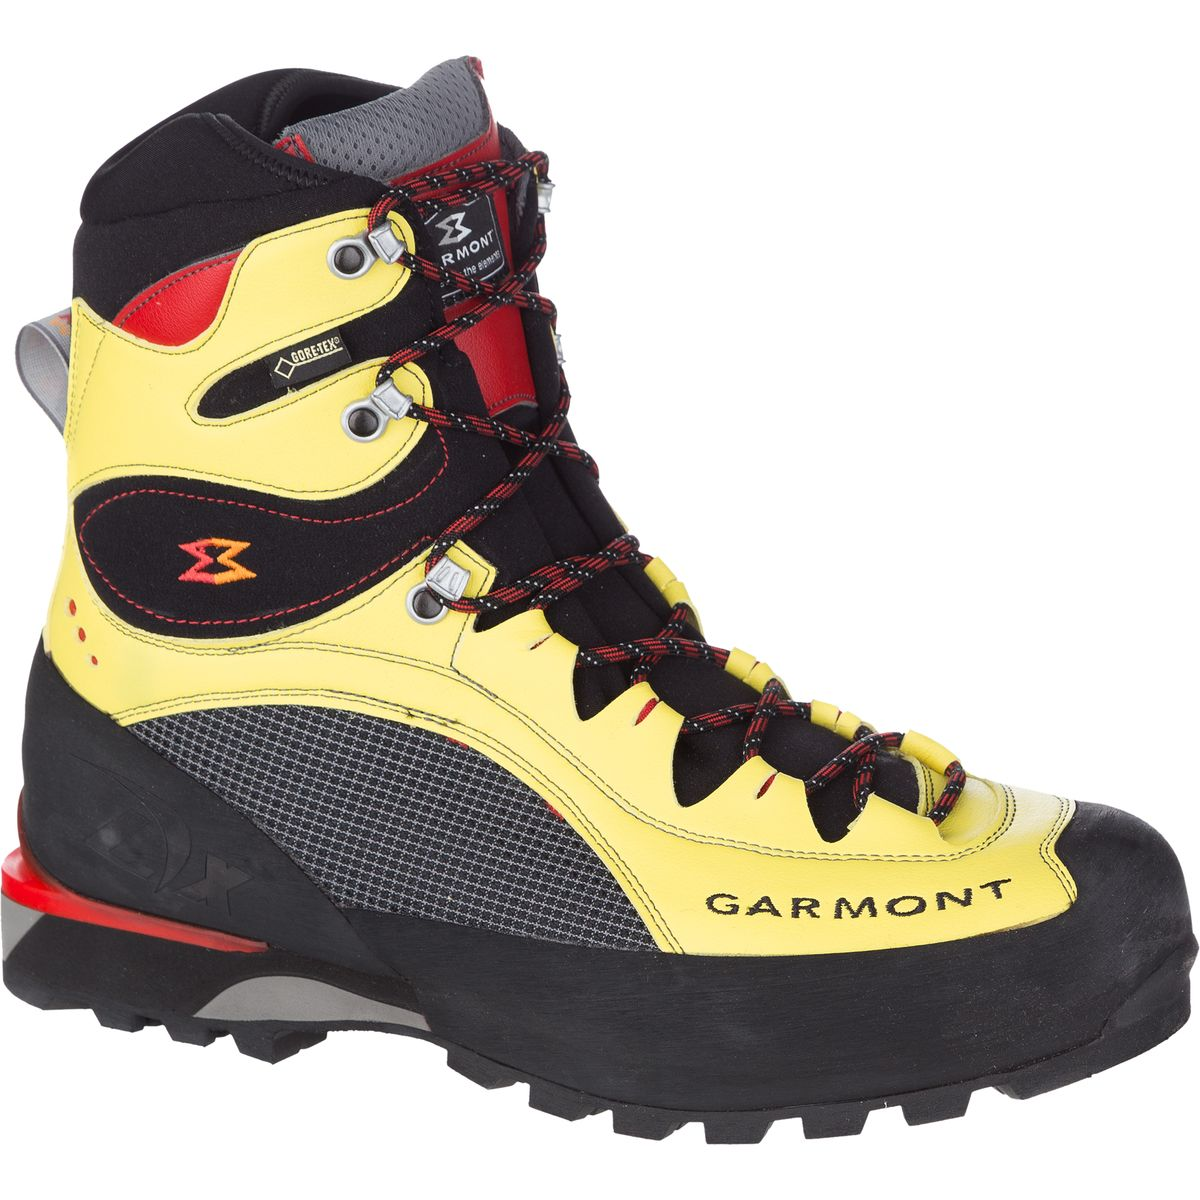 Garmont Tower Extreme LX GTX Mountaineering Boot - Men's